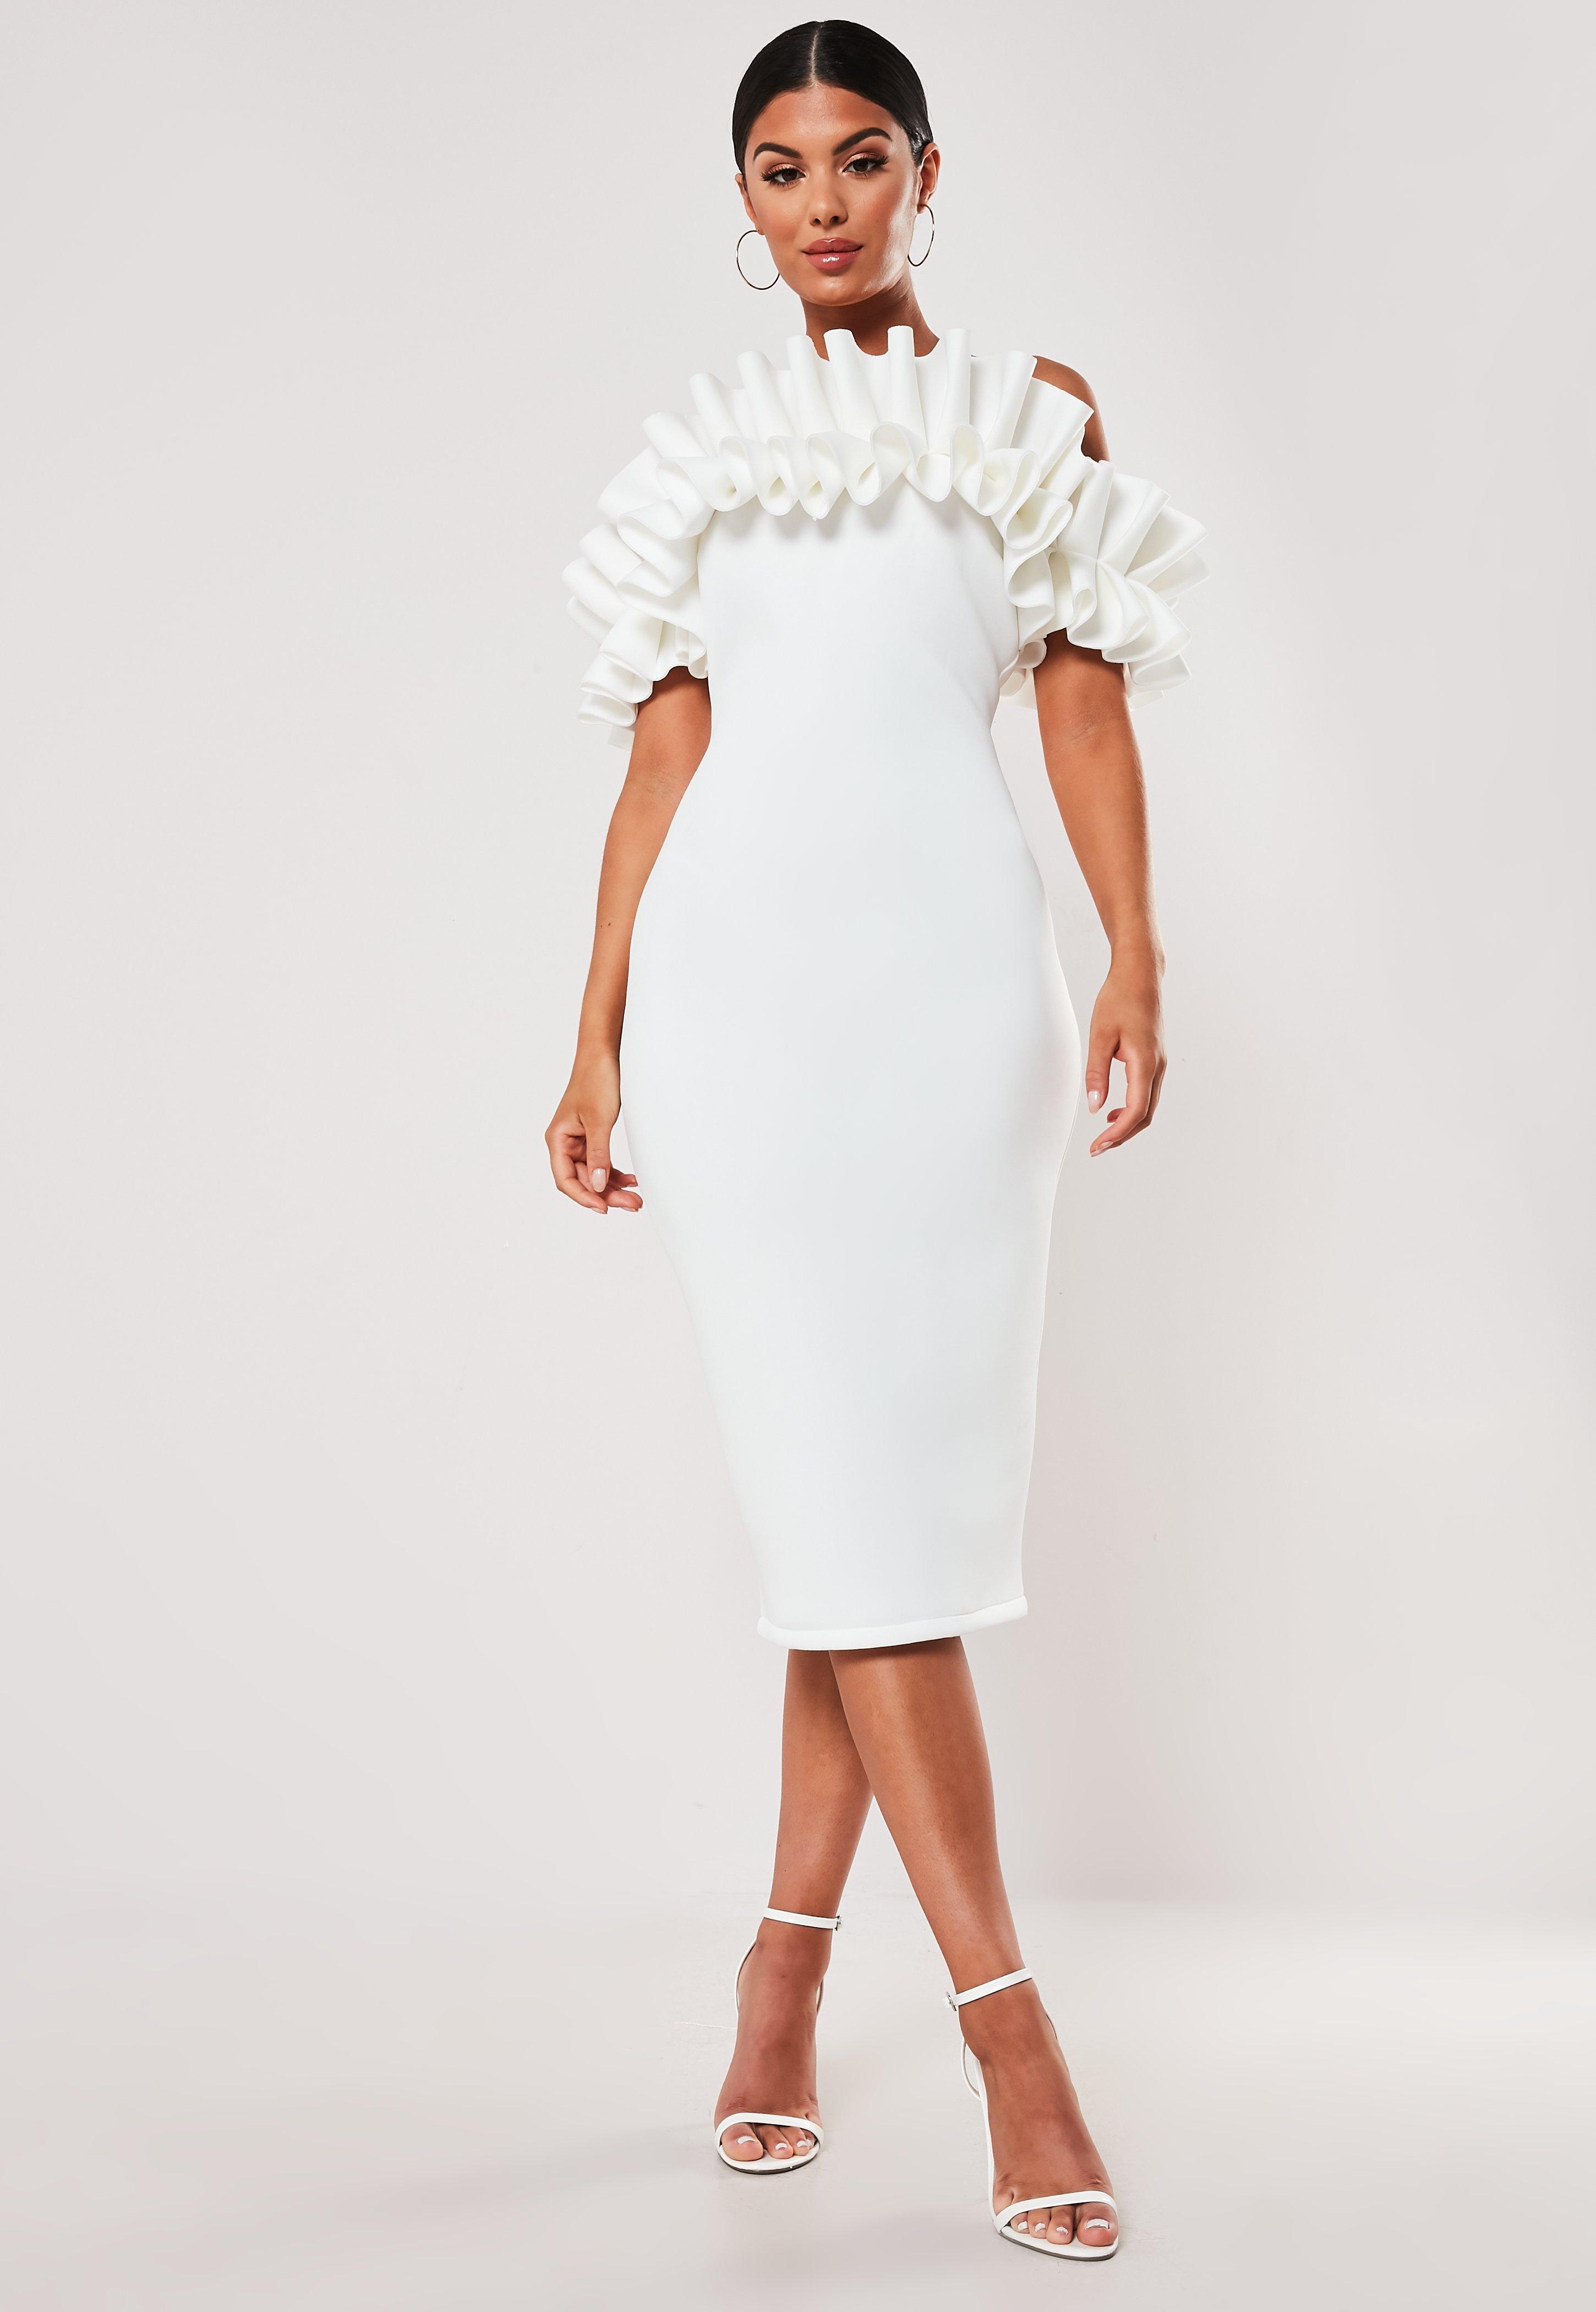 52a59290a Dresses UK | Women's Dresses Online | Missguided